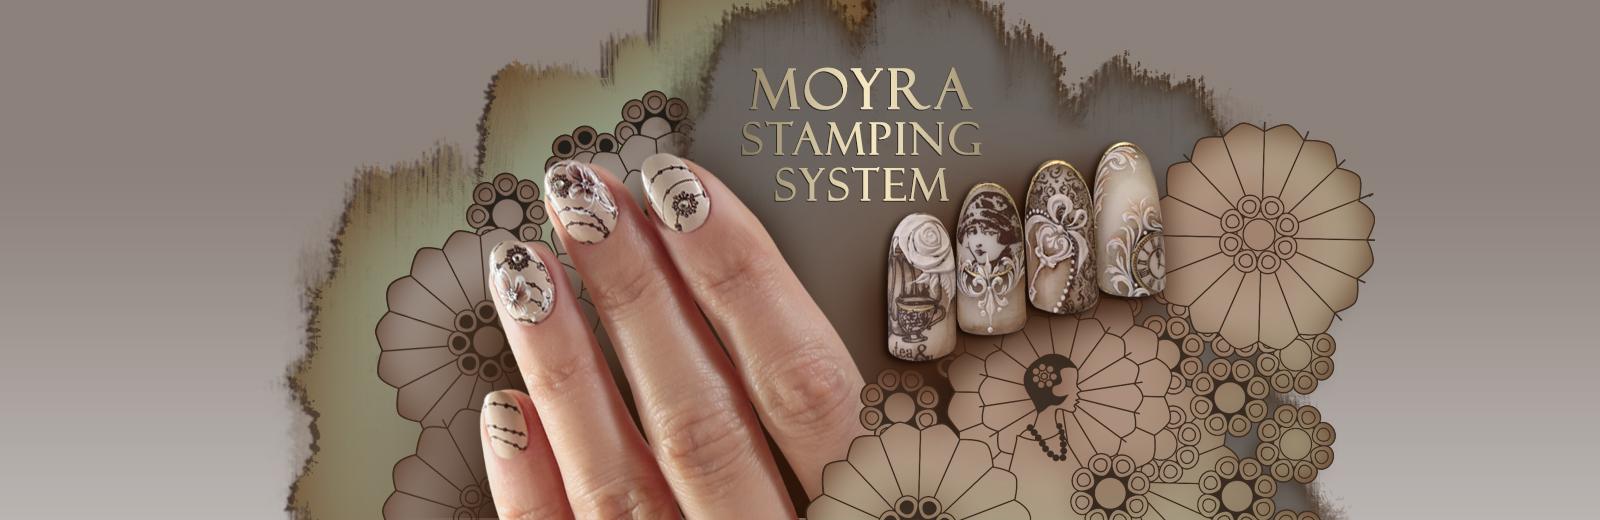 Moyra Stamping System